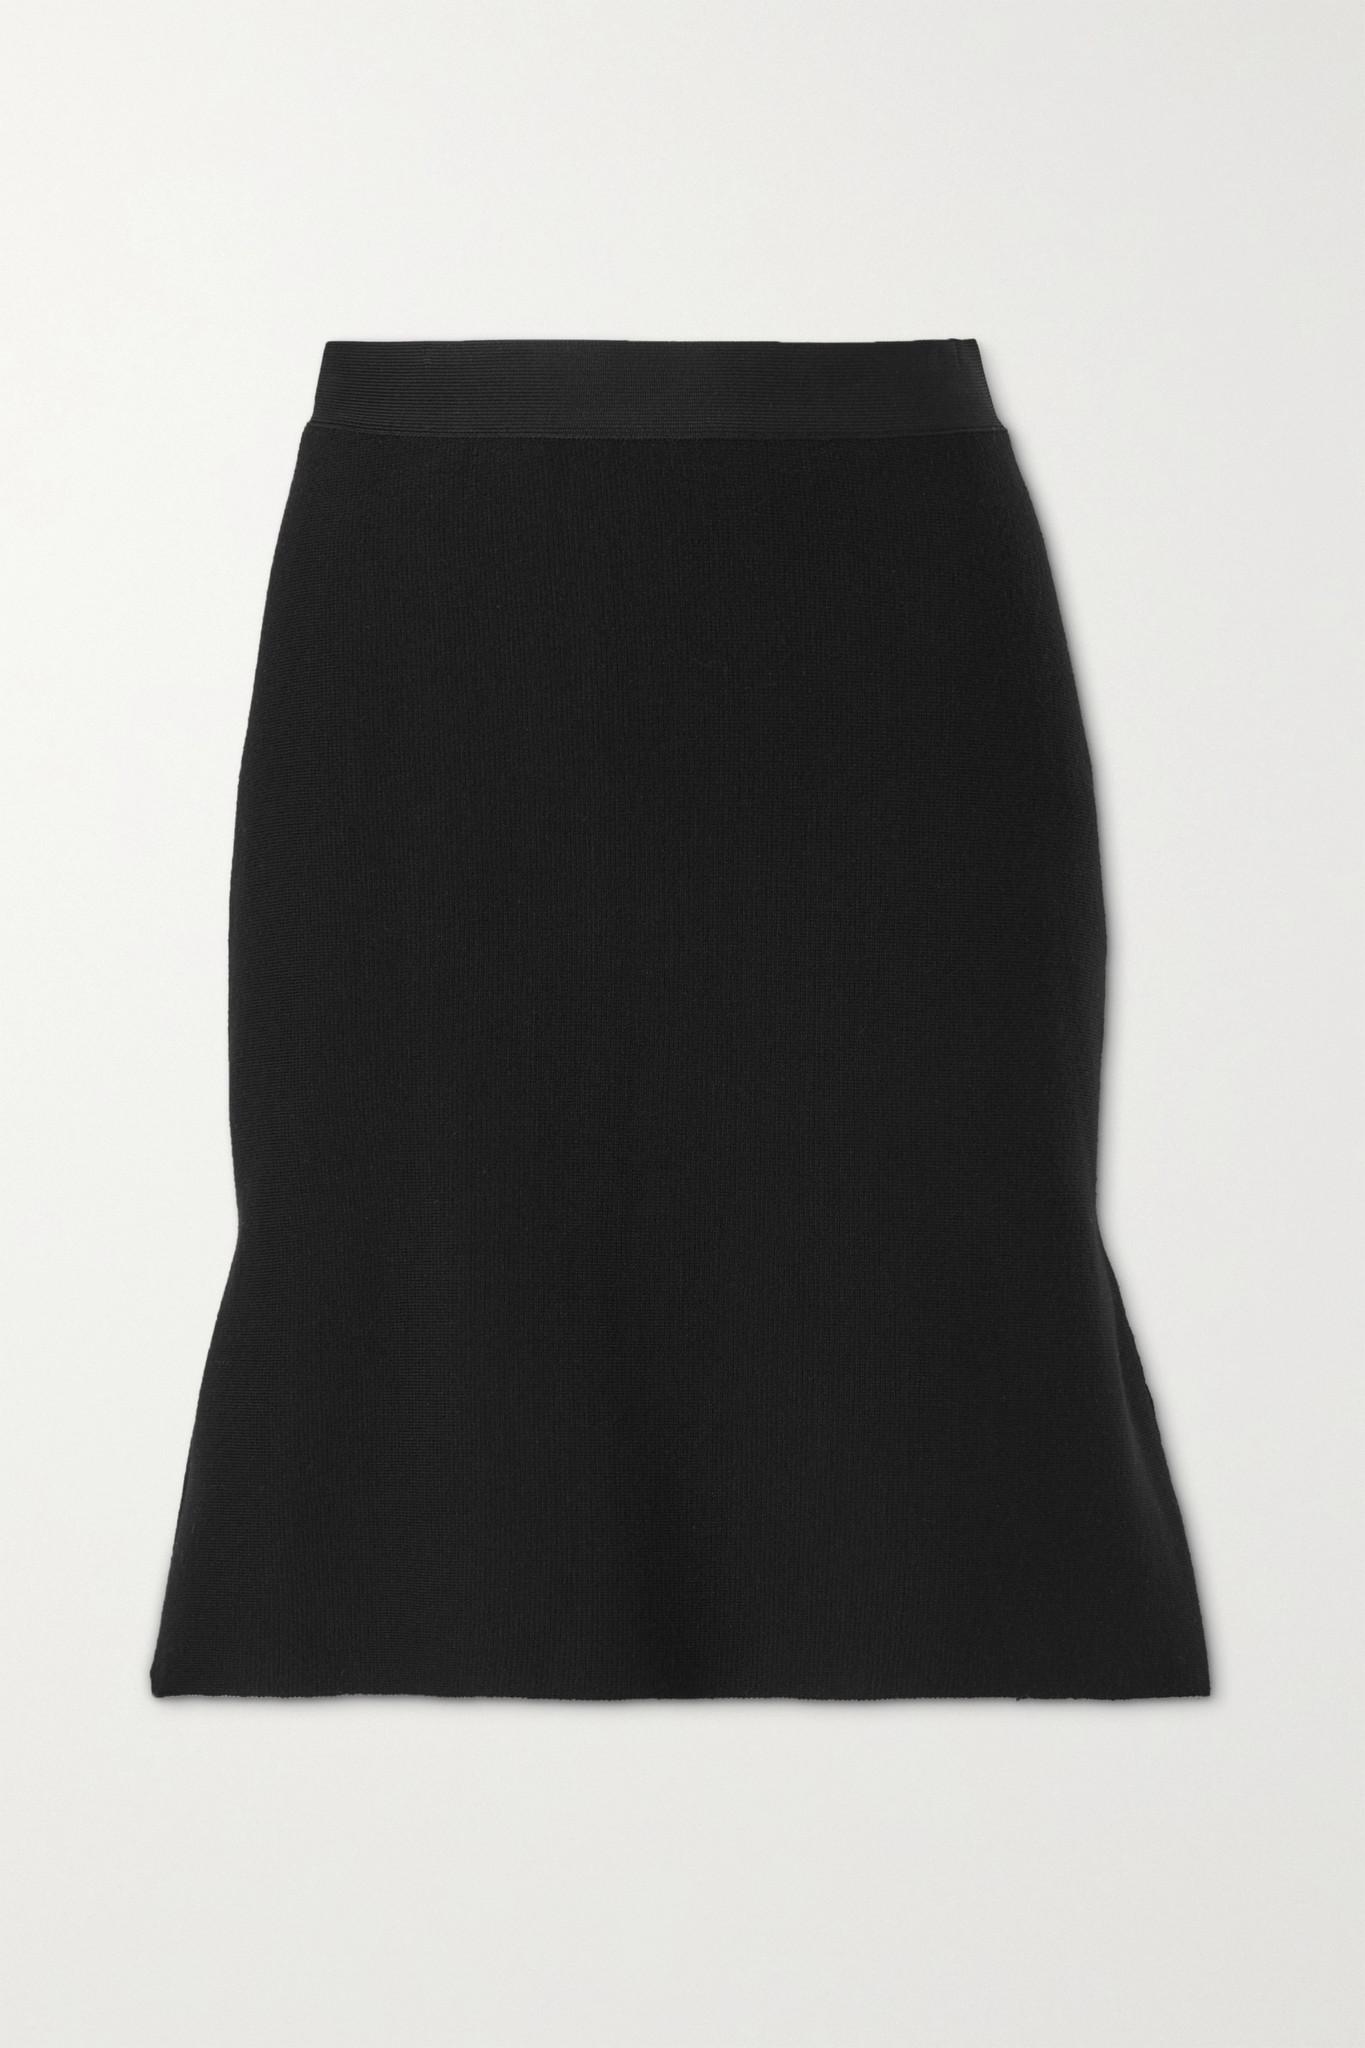 BOTTEGA VENETA - Ruffled Wool-blend Mini Skirt - Black - x small